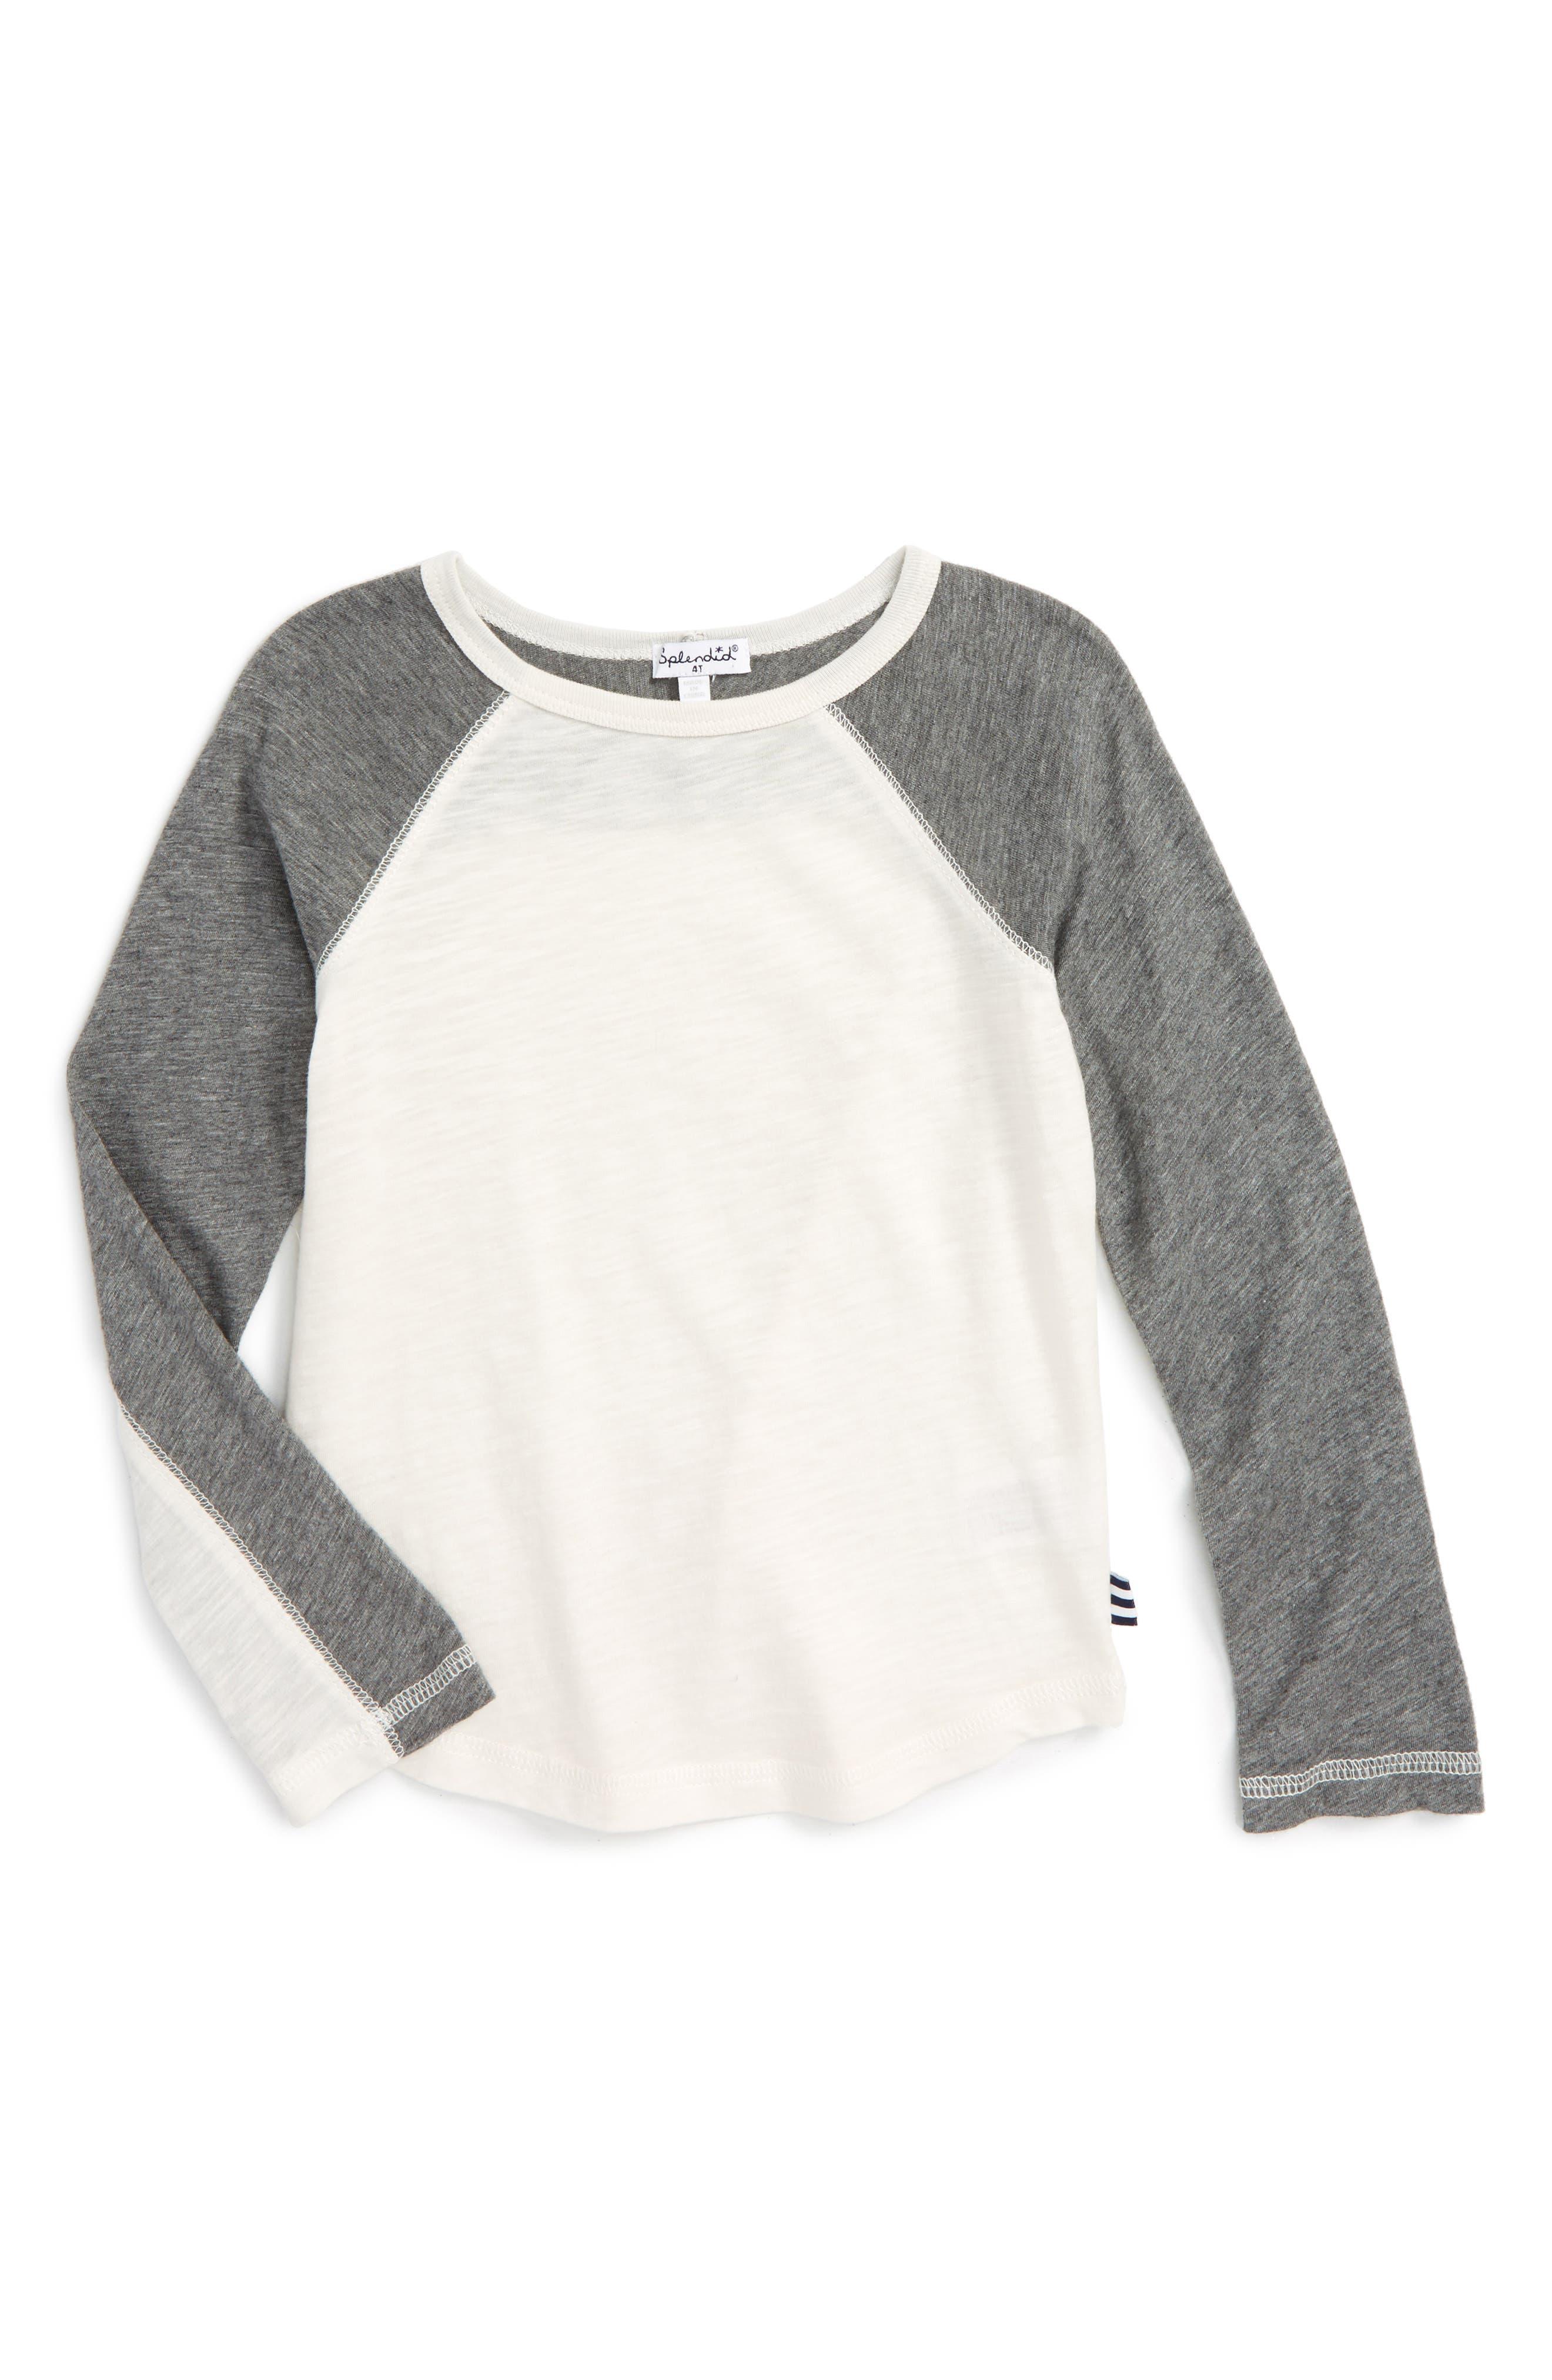 Slub Knit T-Shirt,                             Main thumbnail 1, color,                             Off White Grey